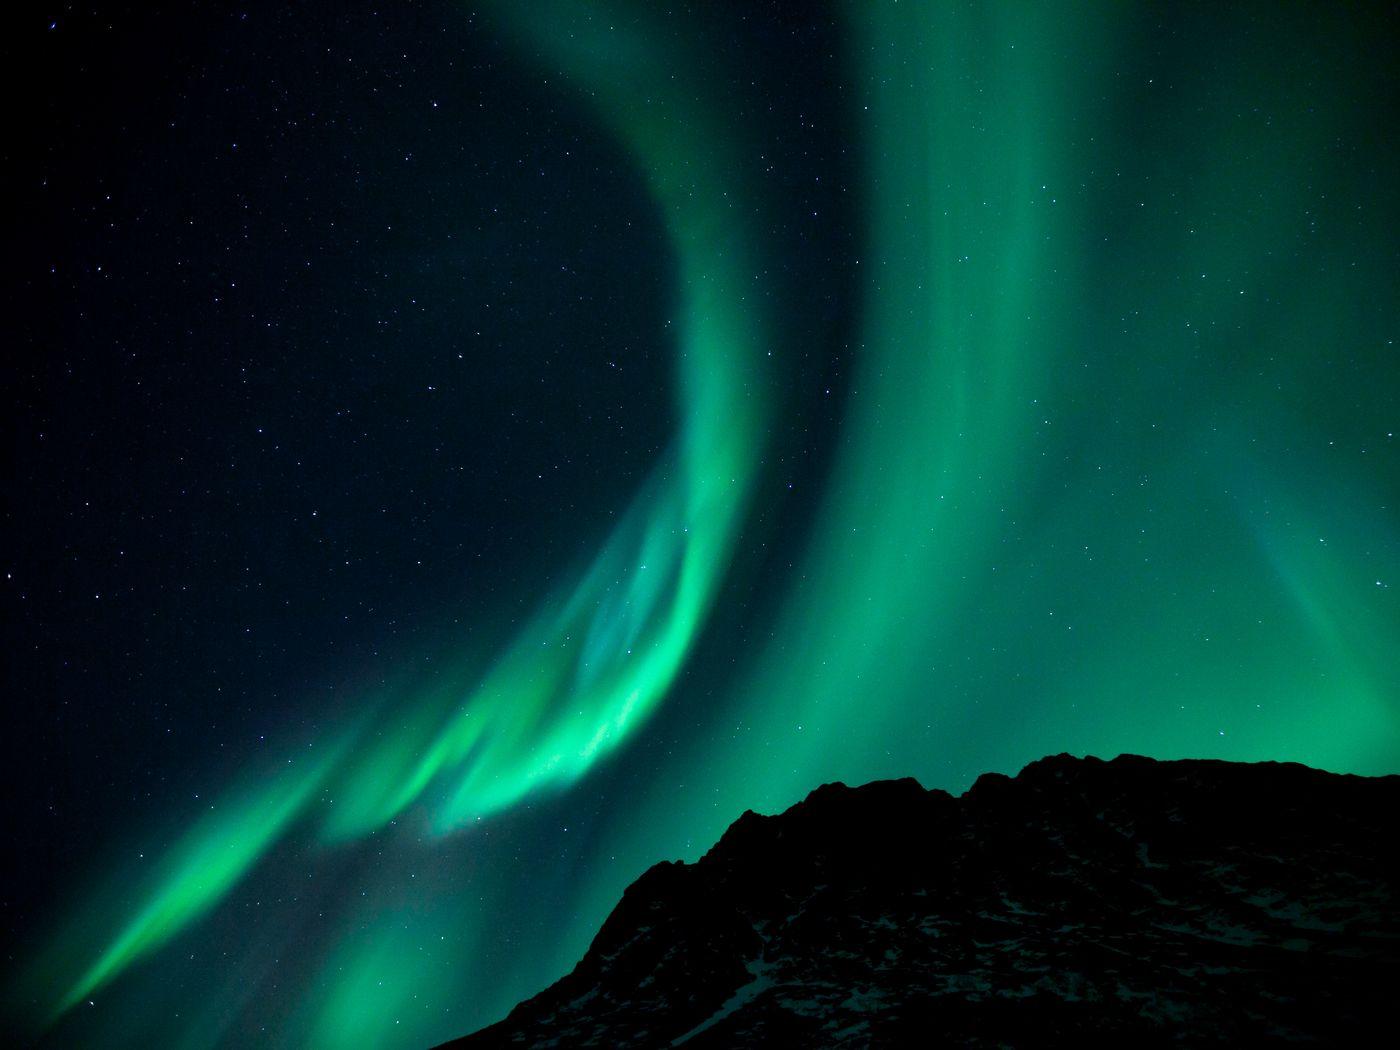 1400x1050 Wallpaper northern lights, night, night sky, phenomenon